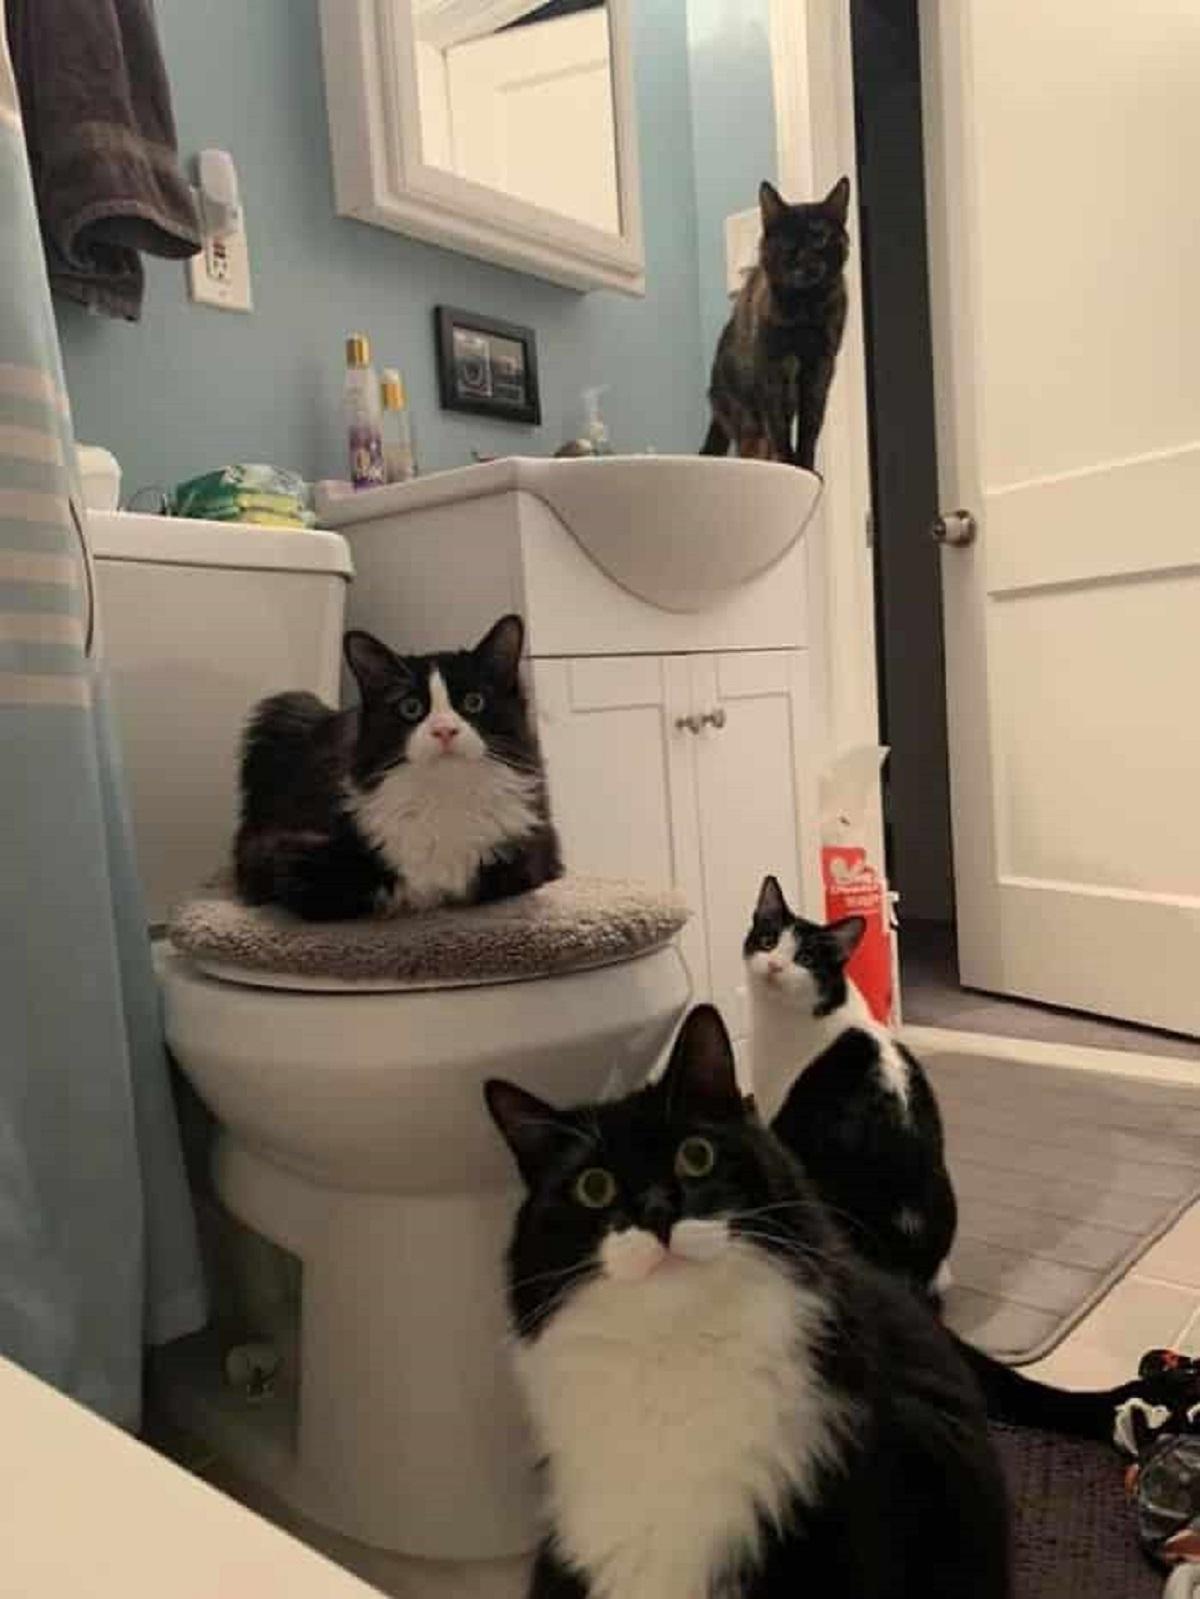 8 foto di gatti-coalizione in bagno